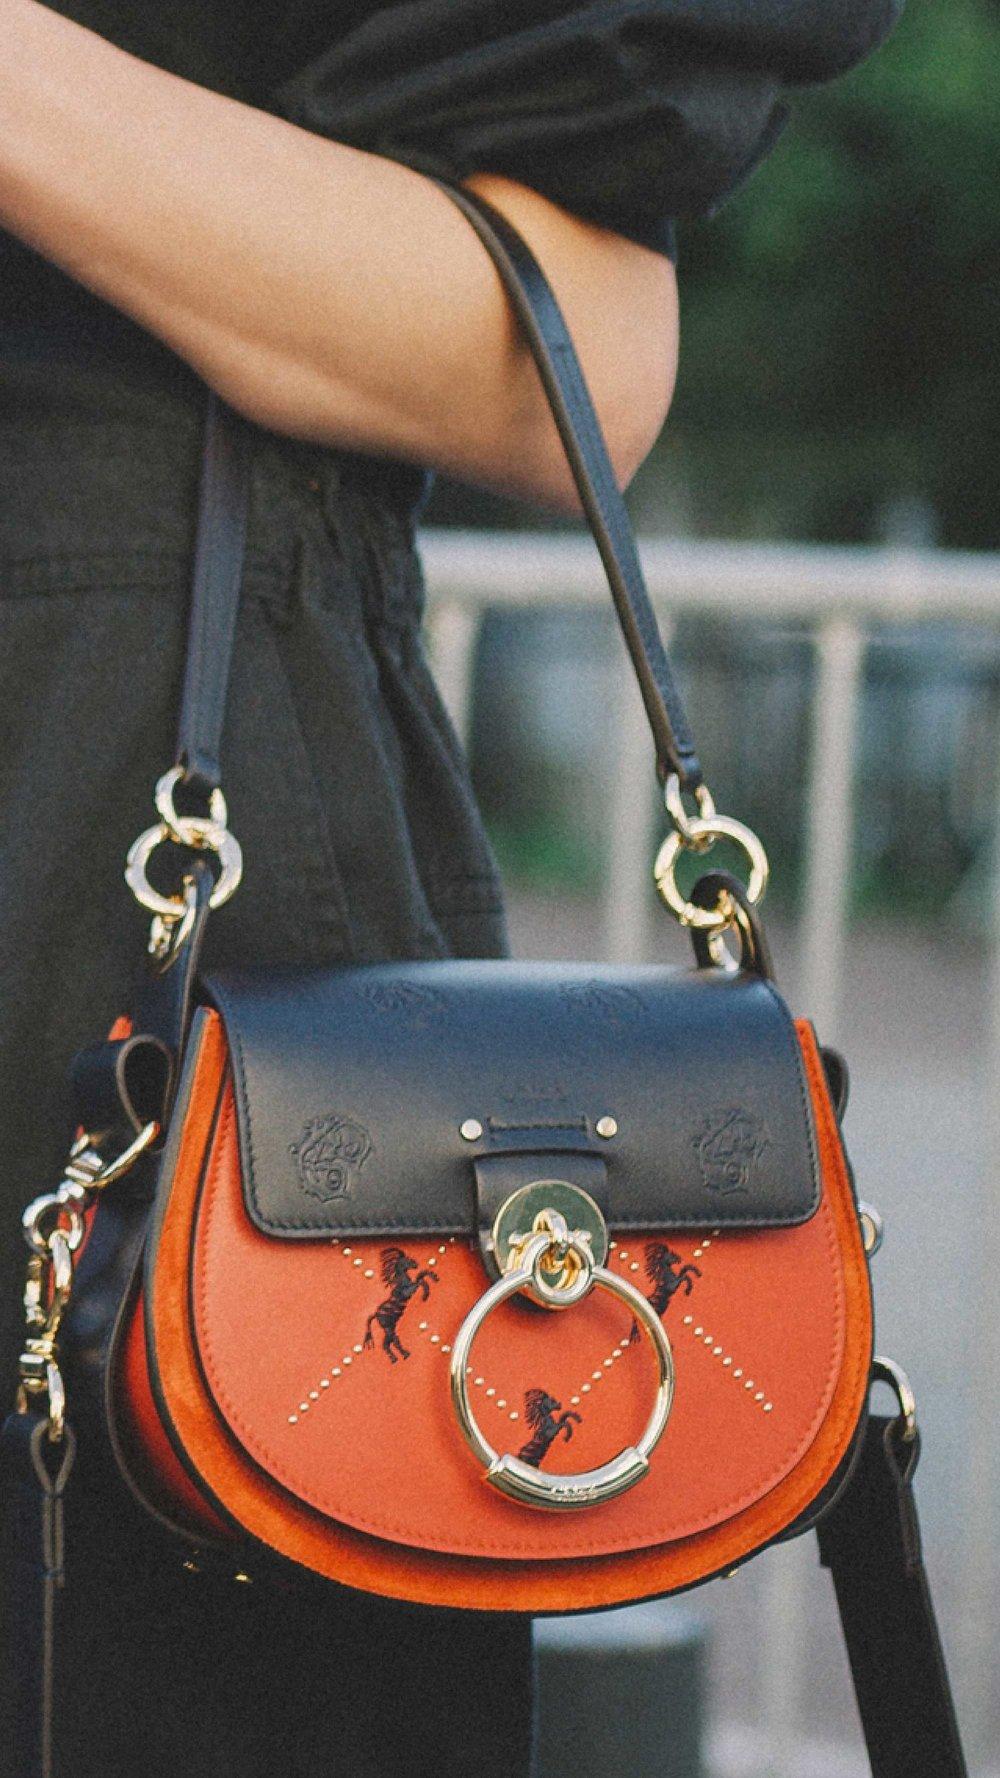 12 Best Chloe bags of Fashion Week -  CHLOe Roy mini leather bucket bag and Chloe Small Tess Leather Shoulder Bag16.jpg